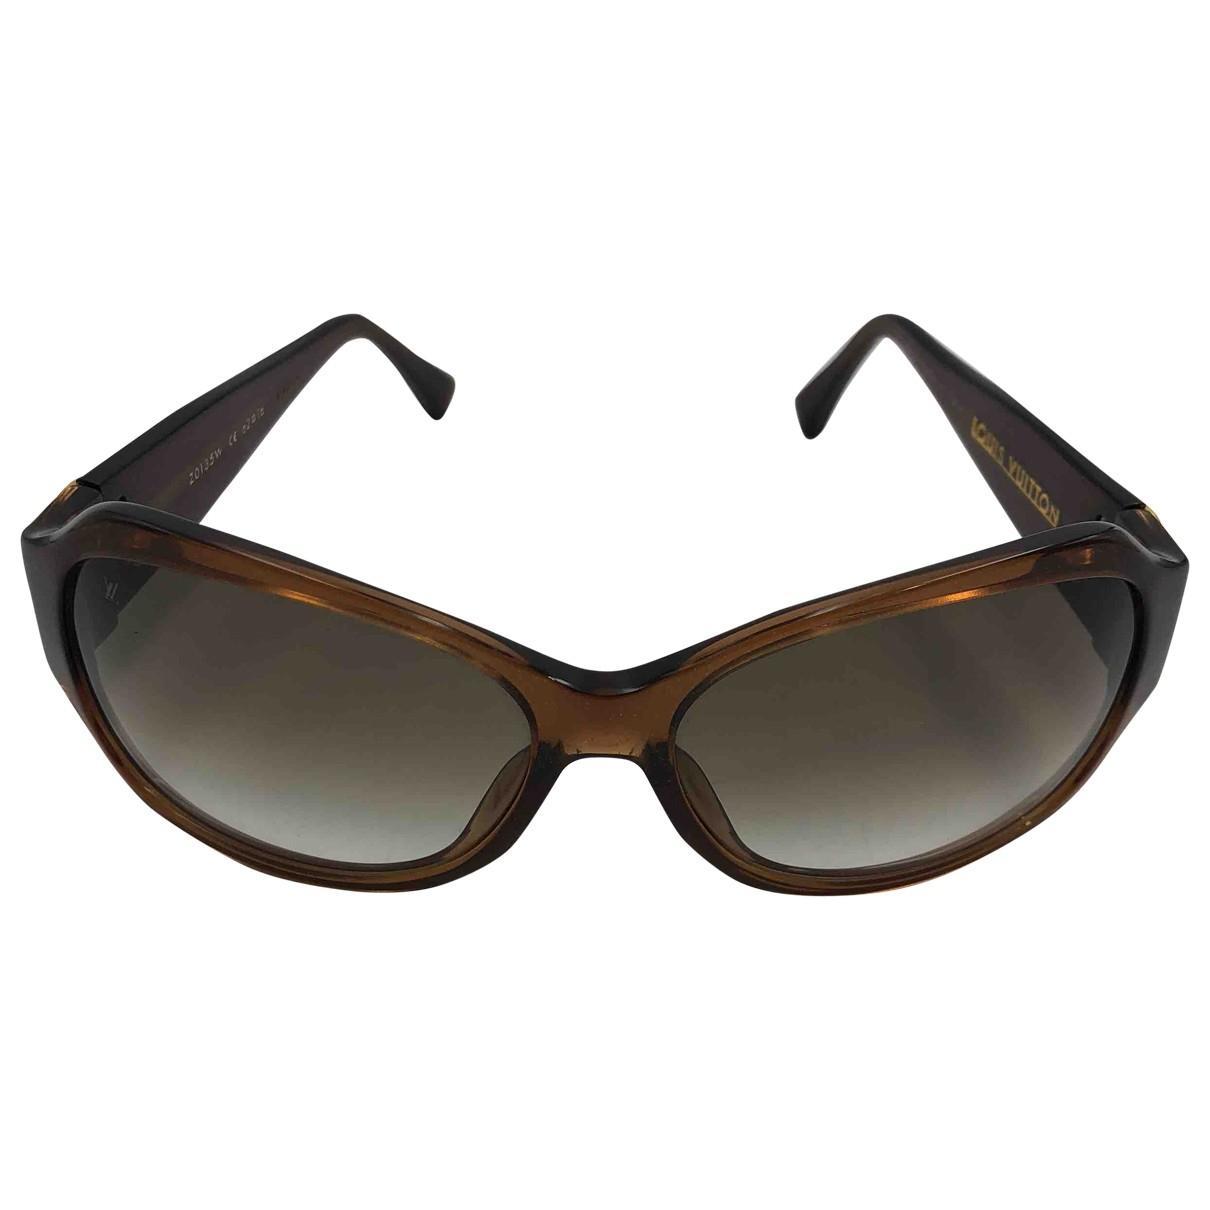 874e5ba5404 Lyst - Louis Vuitton Brown Plastic Sunglasses in Brown